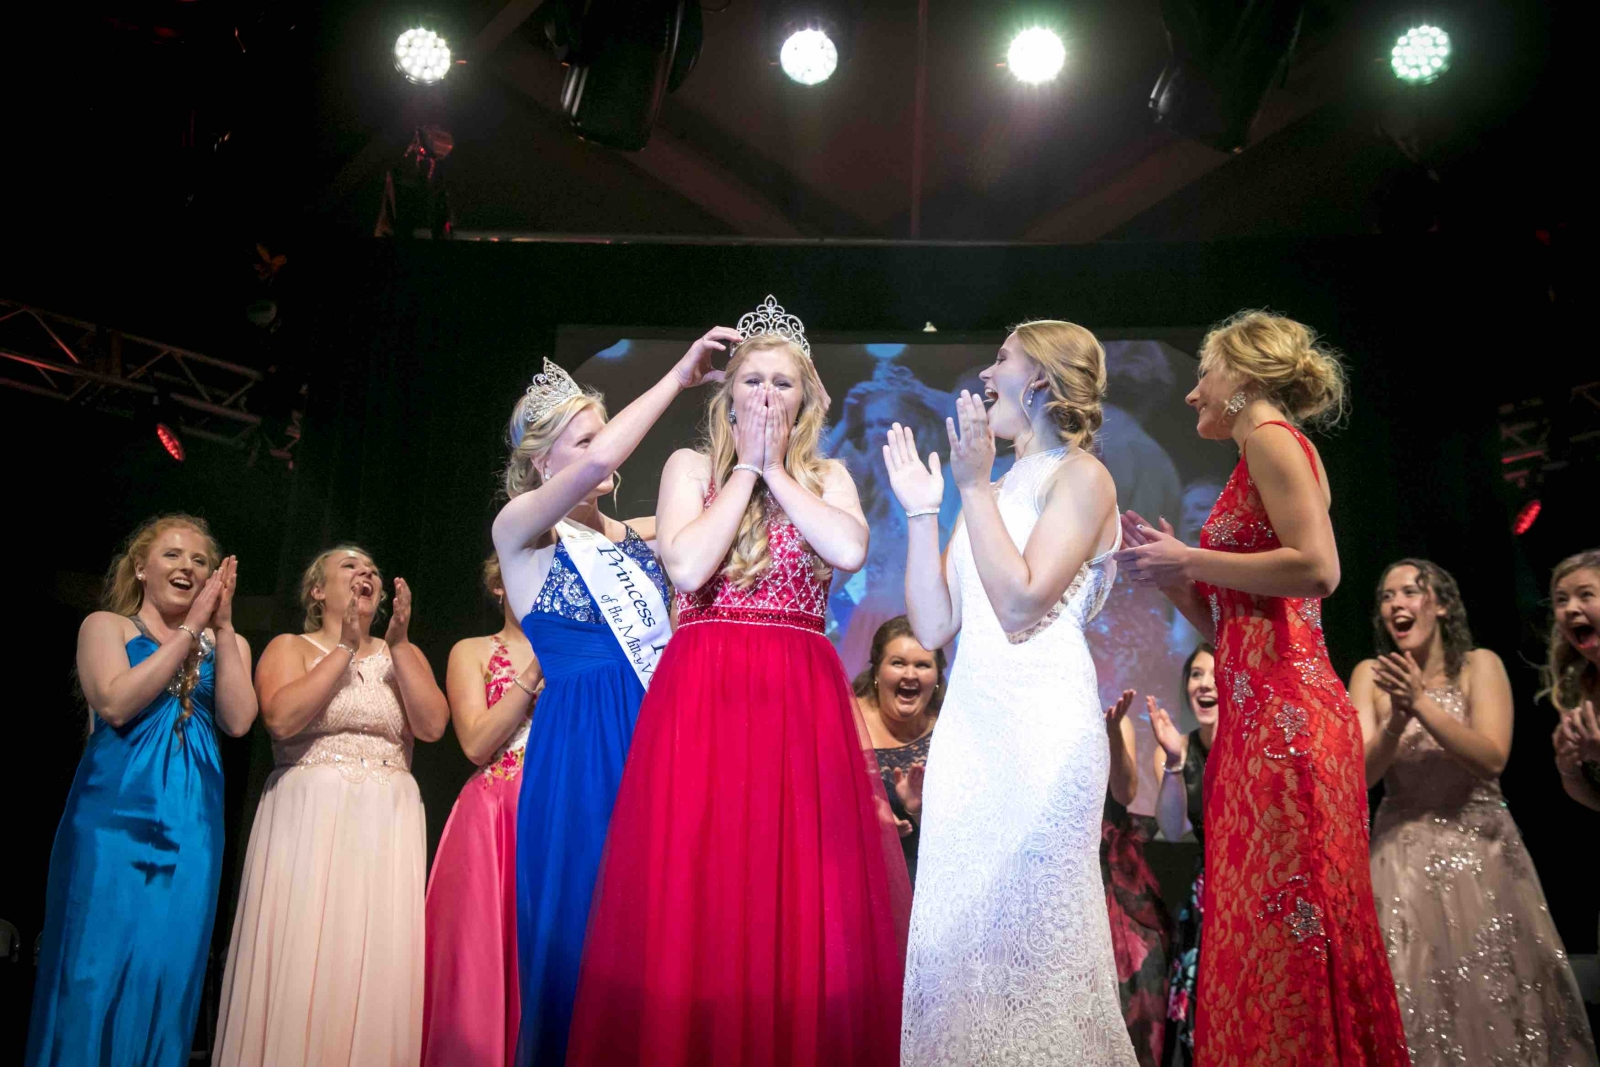 Haley Hinrichs, the 63rd Princess Kay of the Milky Way, crowning Emily Annexstad at the 2017 Princess Kay coronation. Photo by Matt Addington.